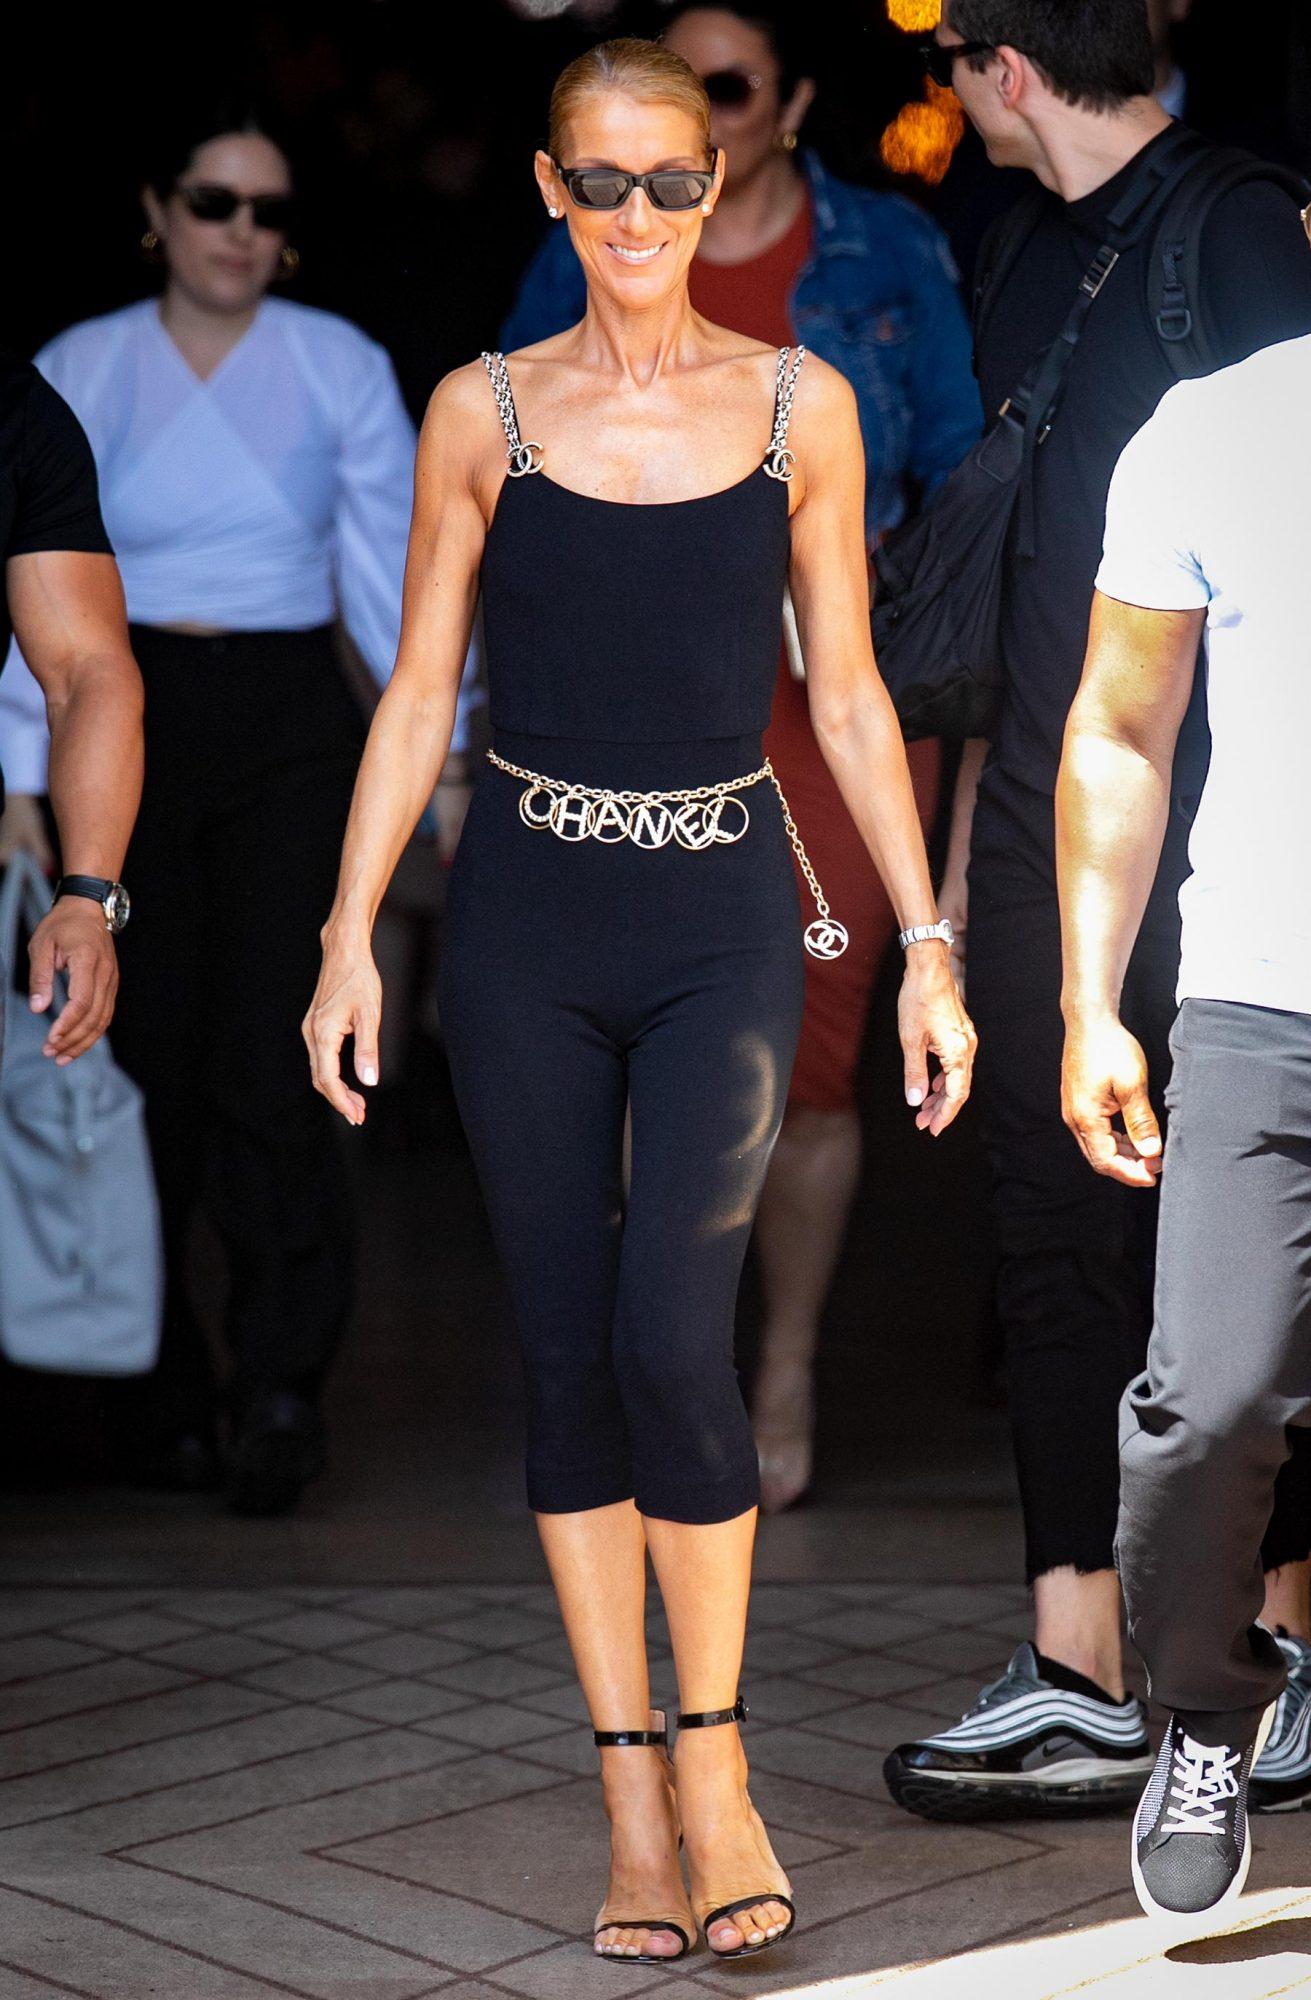 PARIS, FRANCE - JUNE 27: Singer Celine Dion is seen on June 27, 2019 in Paris, France. (Photo by Marc Piasecki/GC Images)